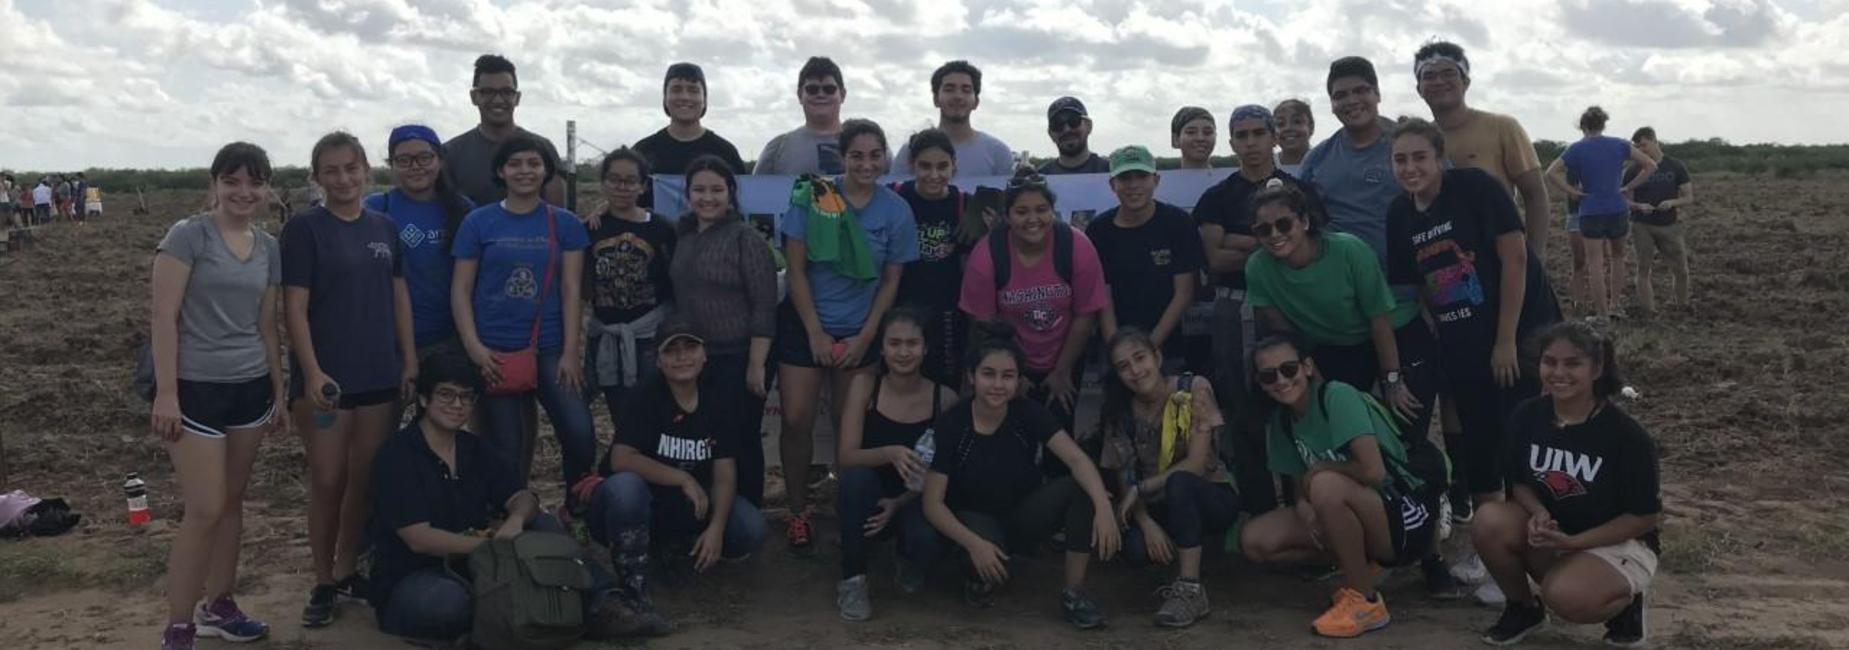 Lamar students doing community service